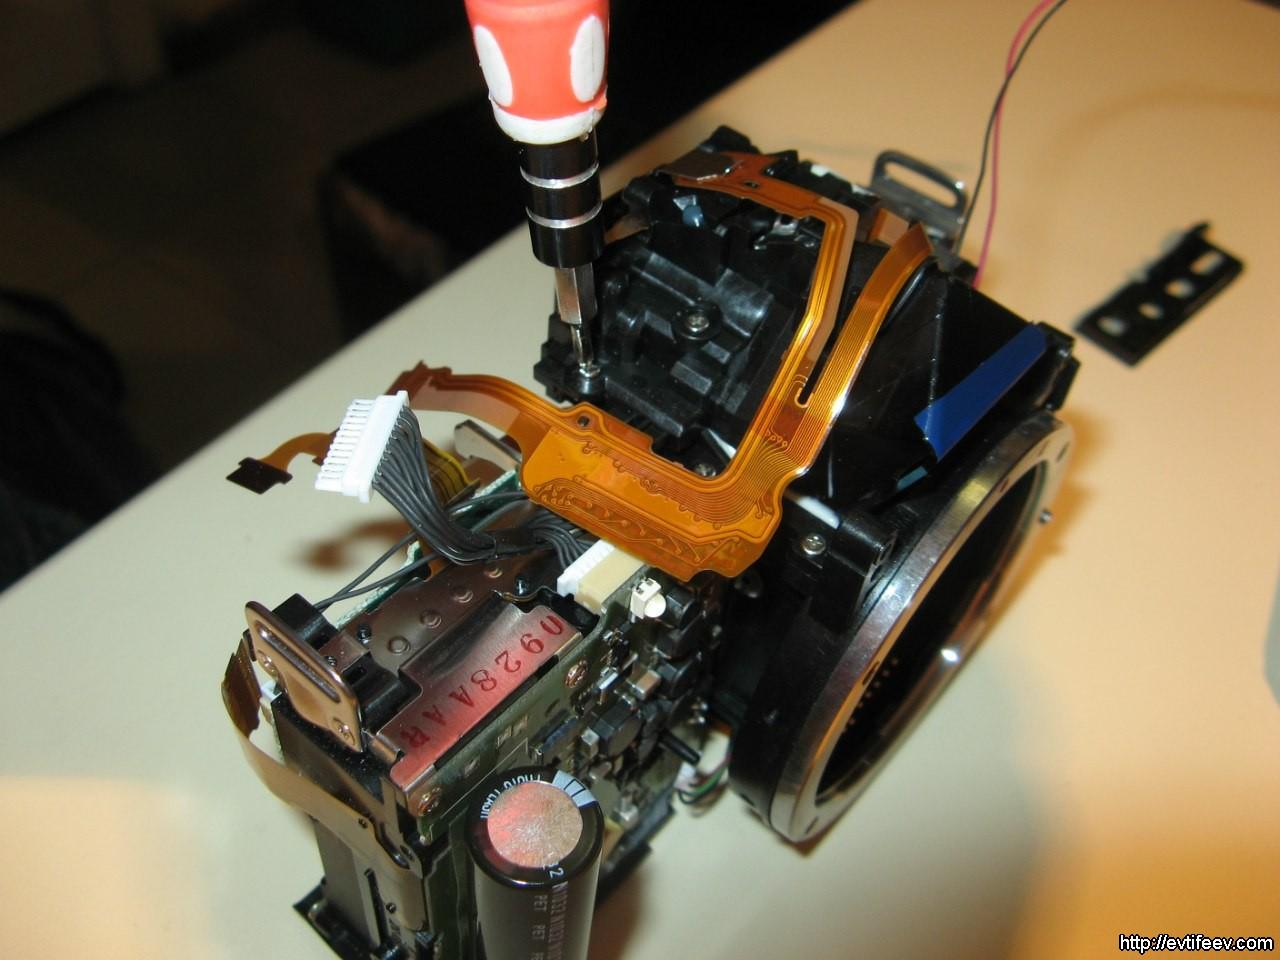 Ремонт фотоаппарата casio своими руками